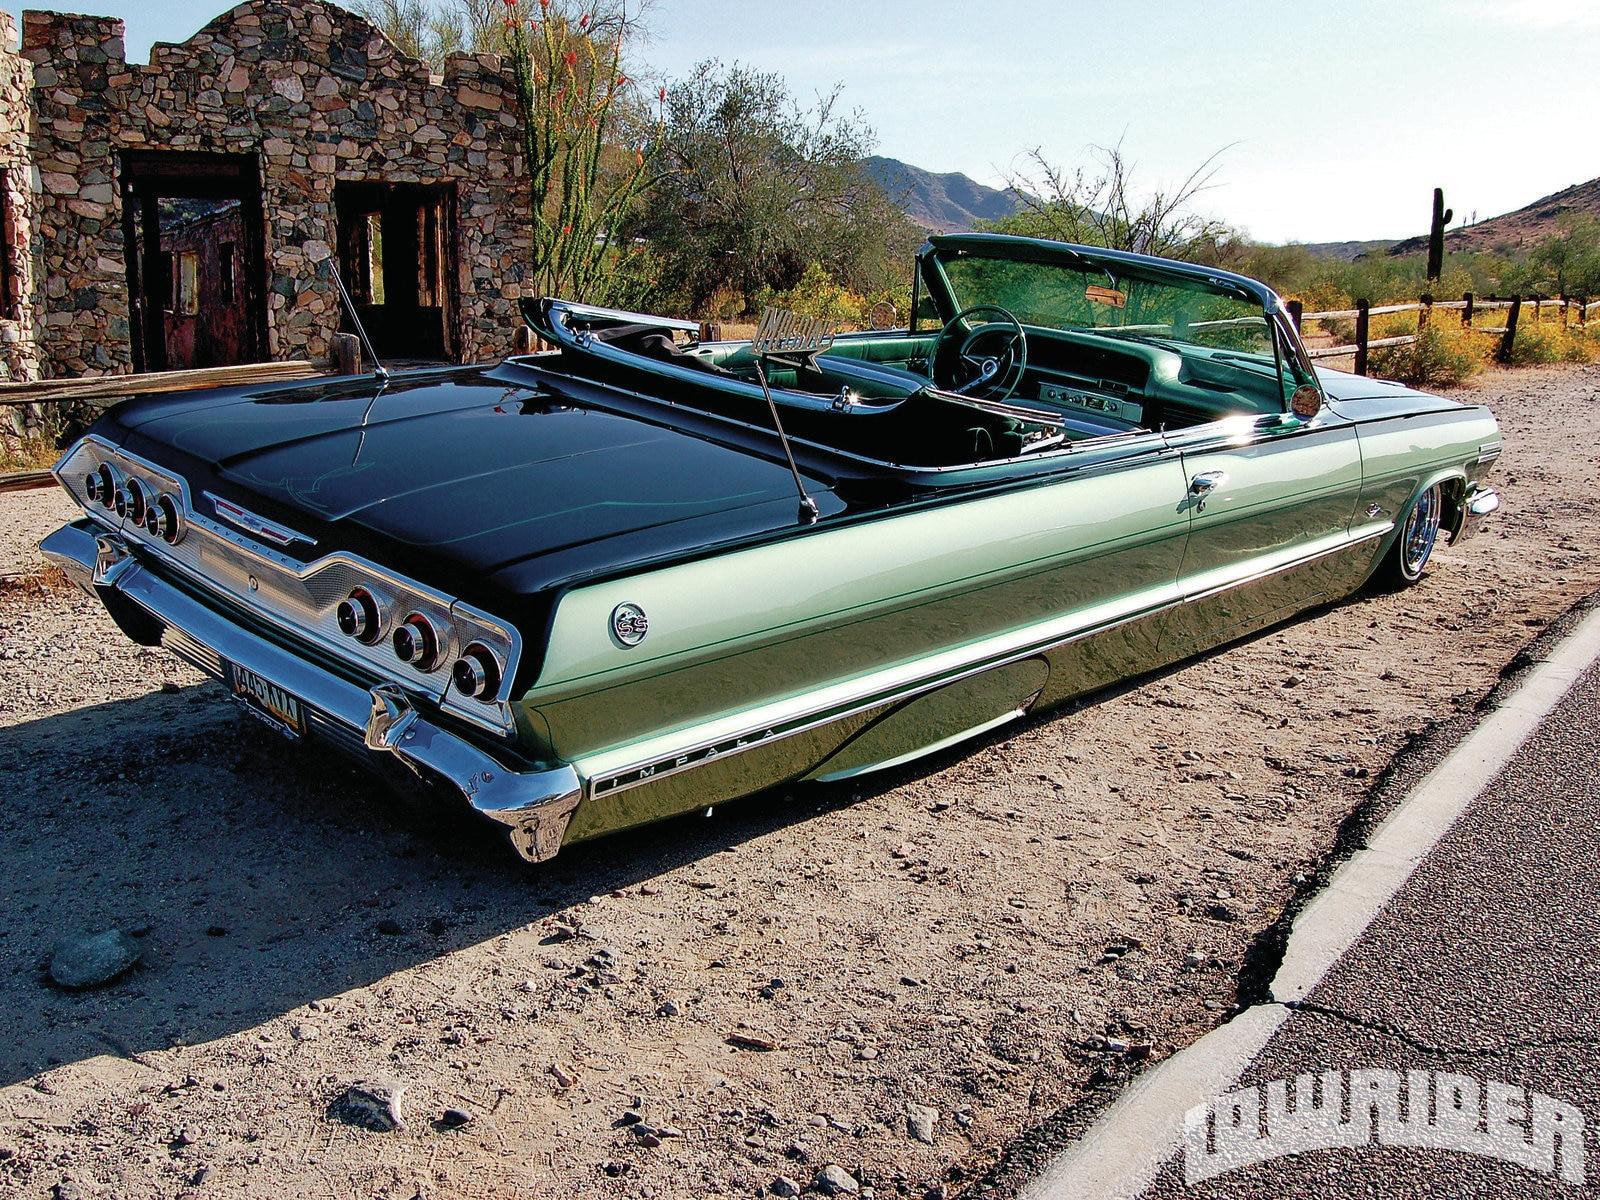 1963 Chevrolet Impala SS - Lowrider Magazine